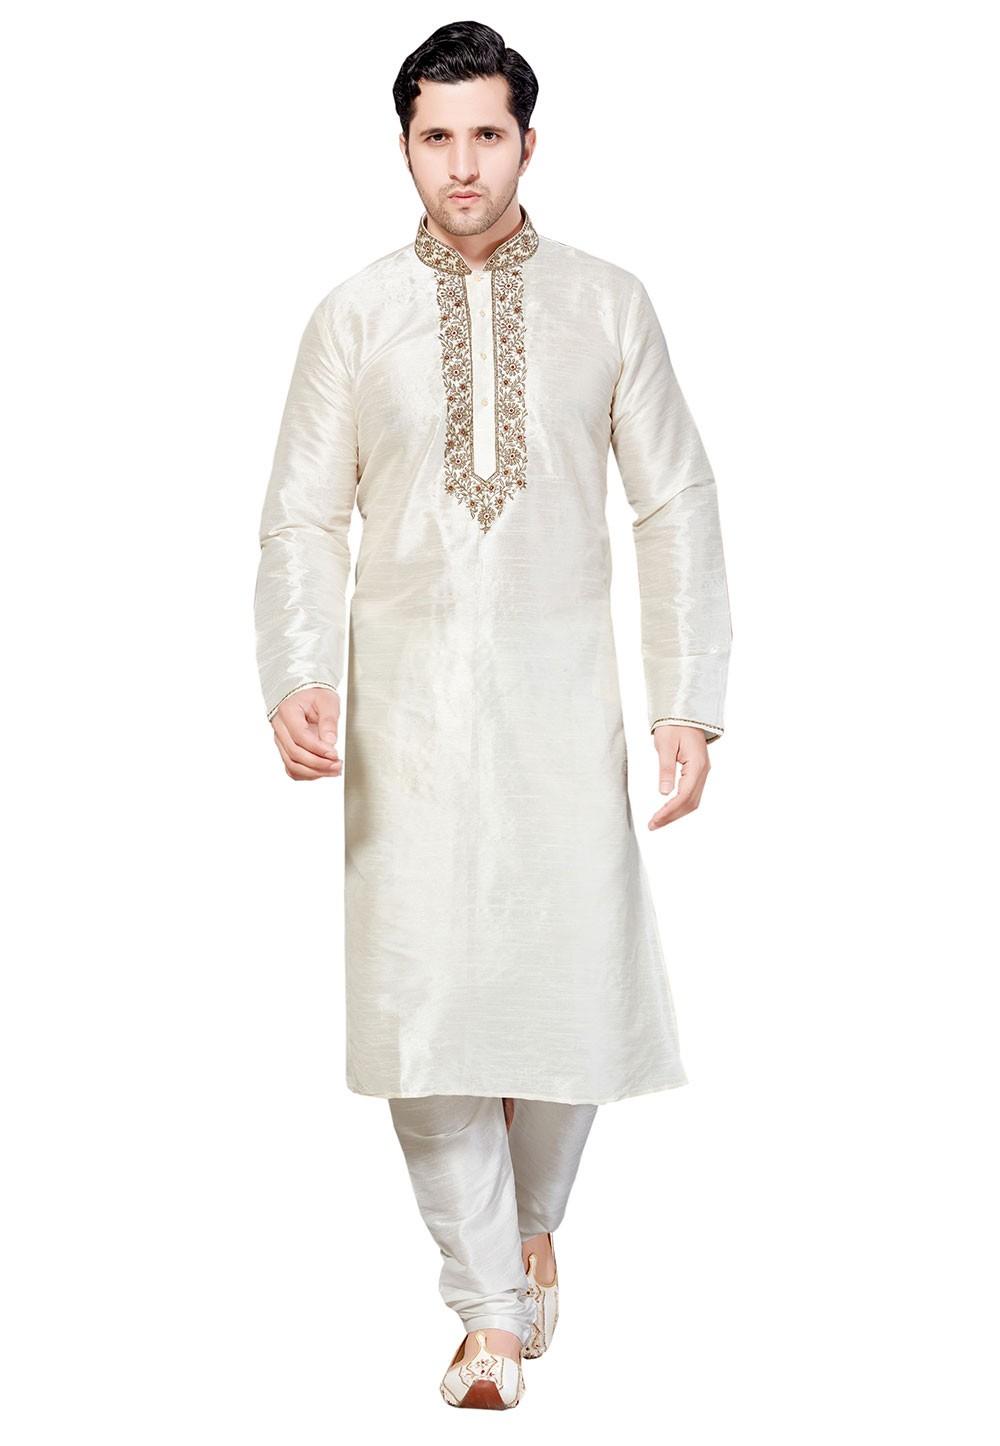 Men's Exquisite Cream Color Dupion Silk Readymade Kurta Pyjama.